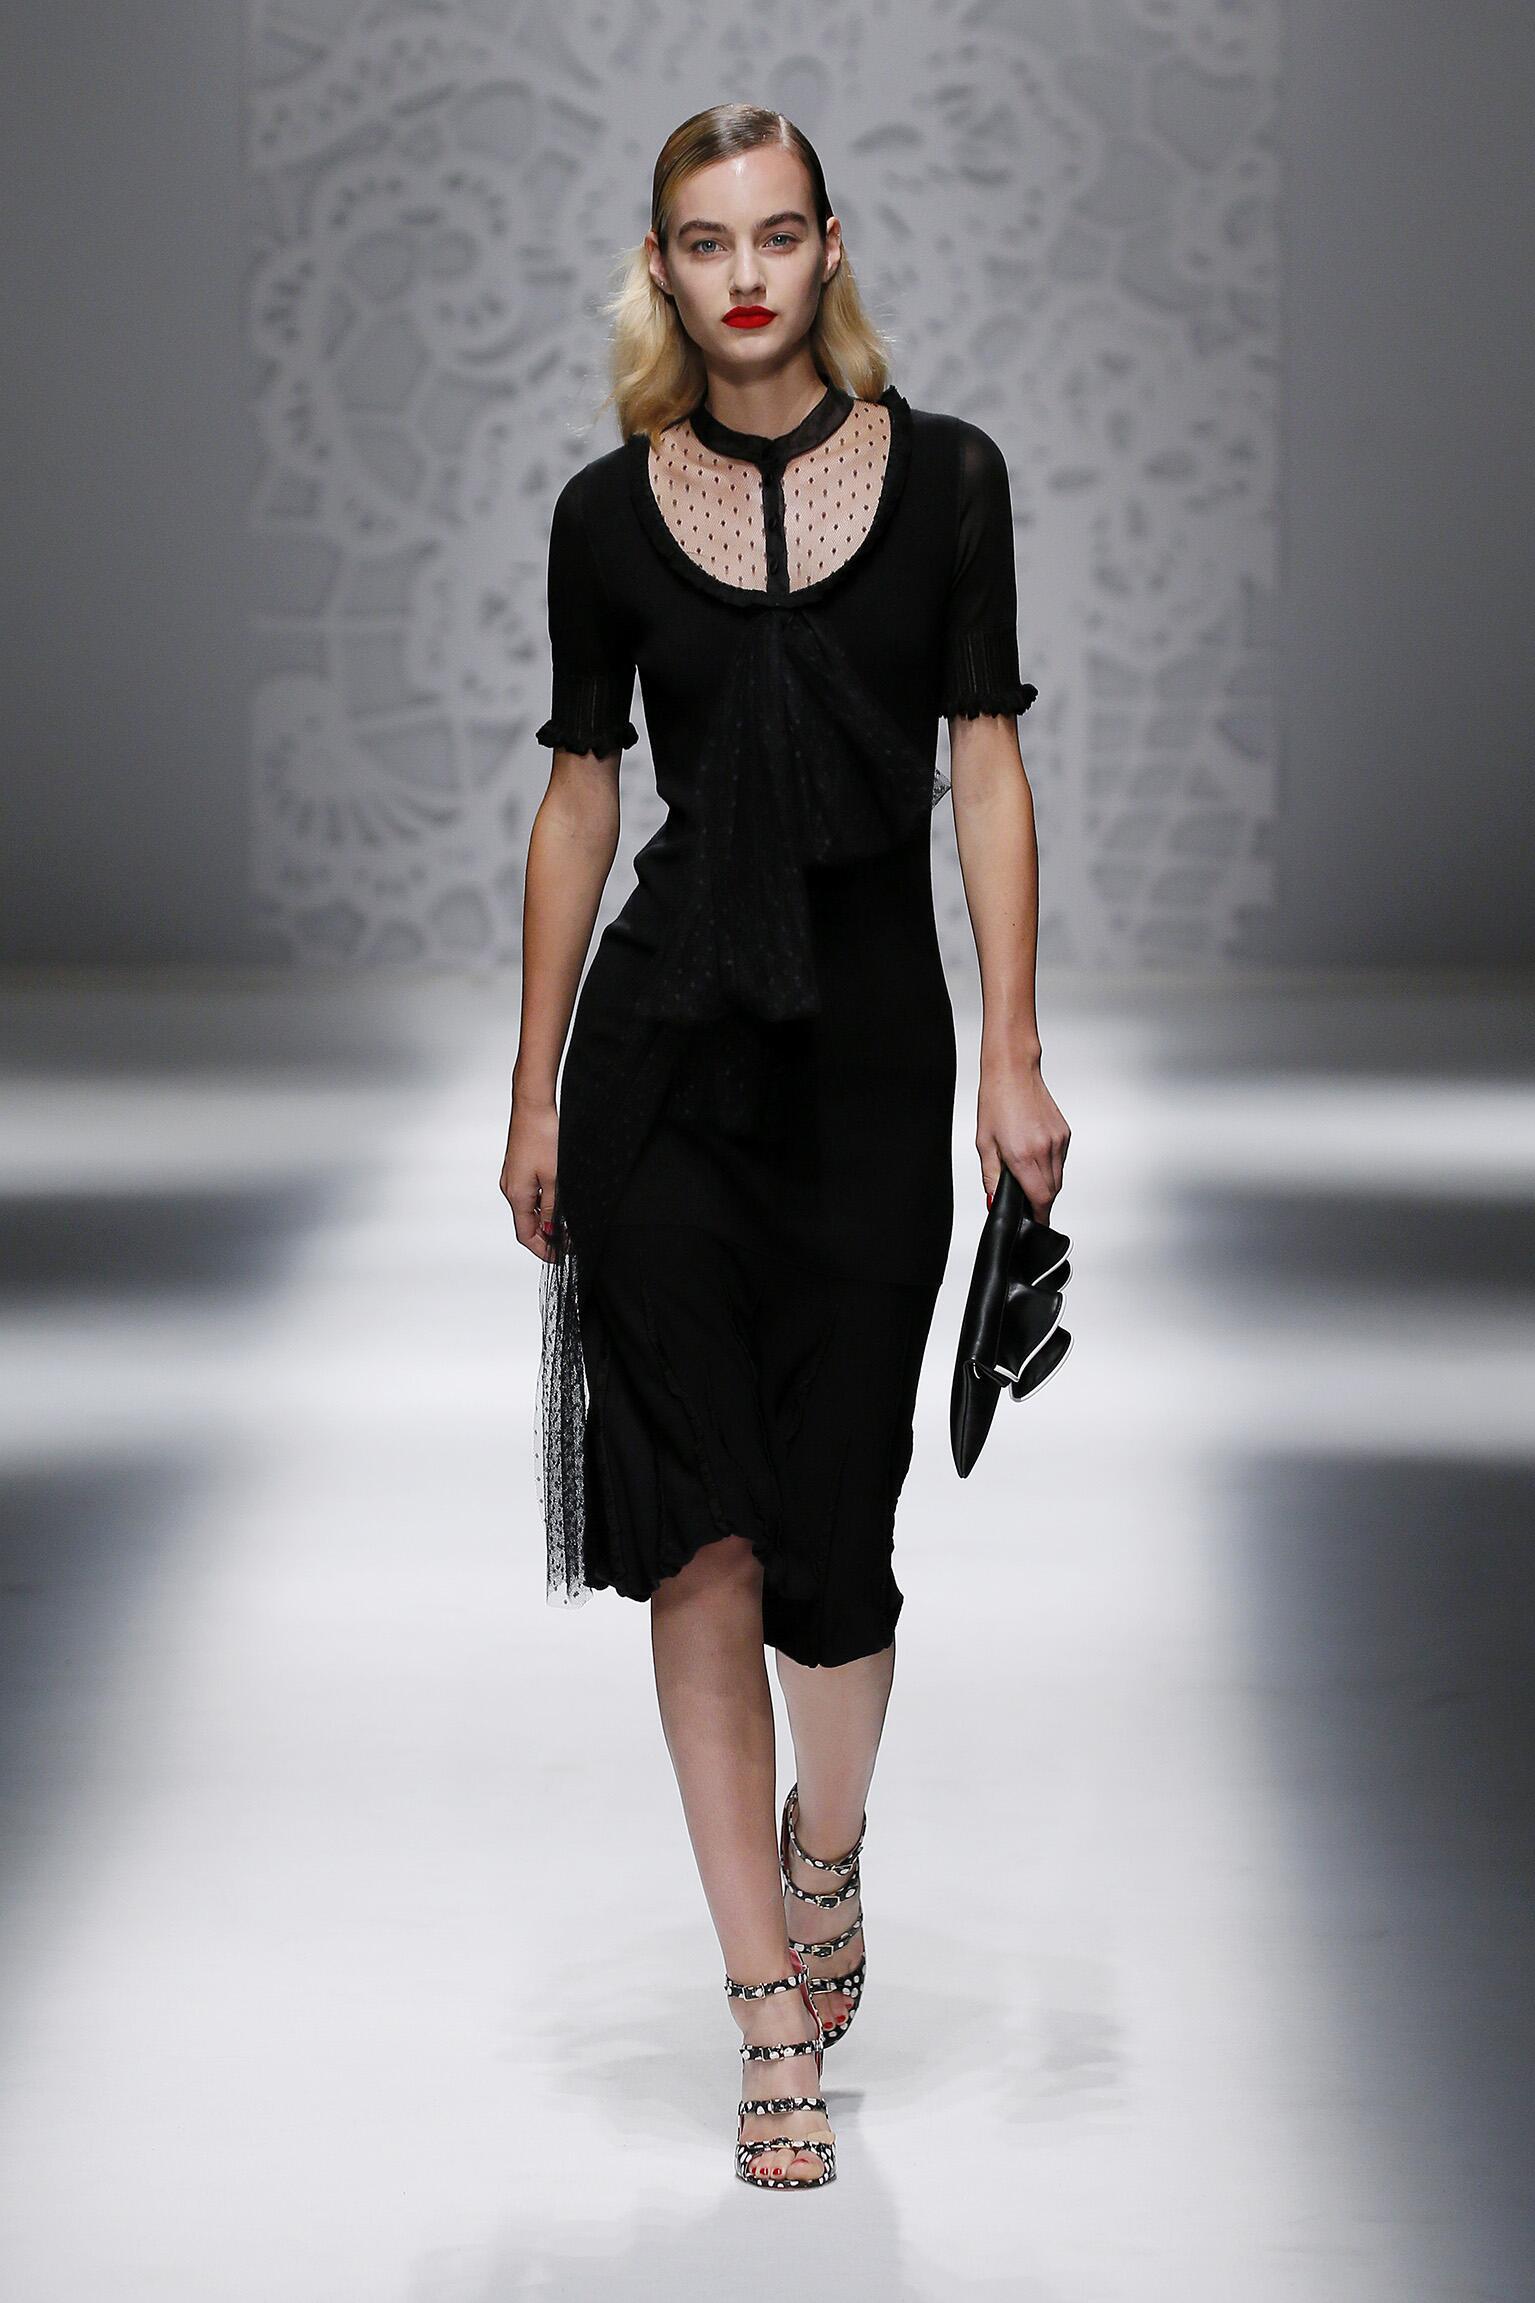 Model Fashion Show Blumarine